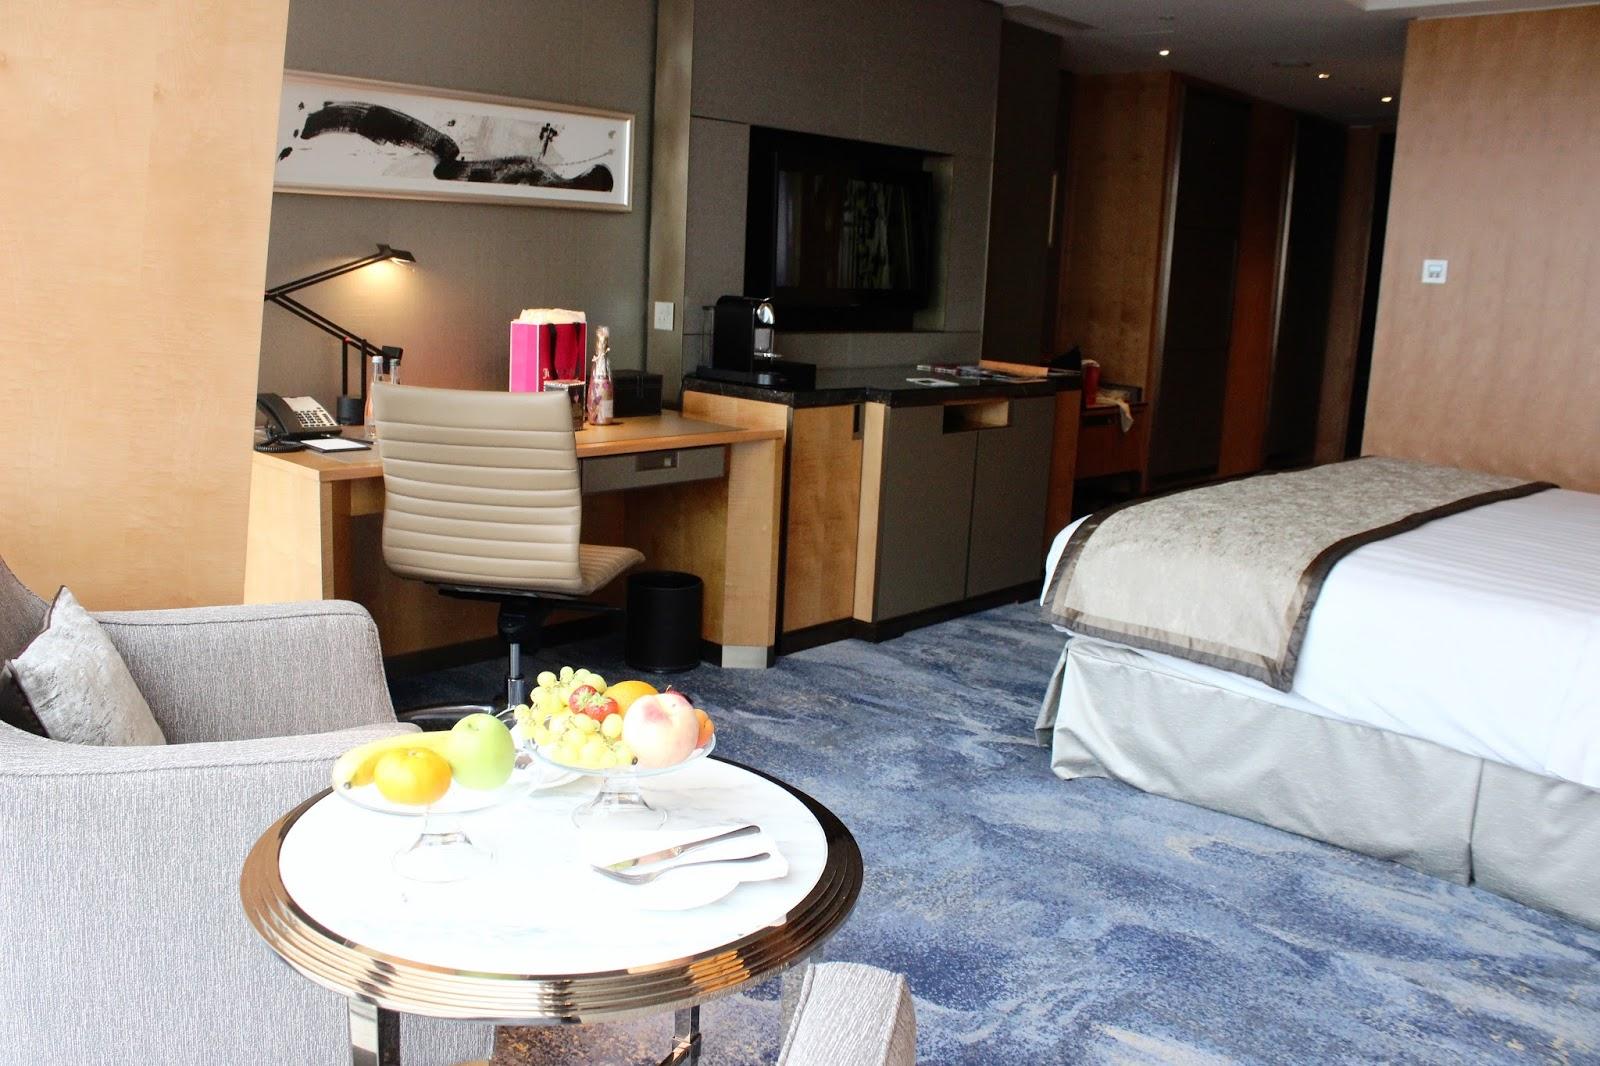 Shangri-La Hotel The Shard